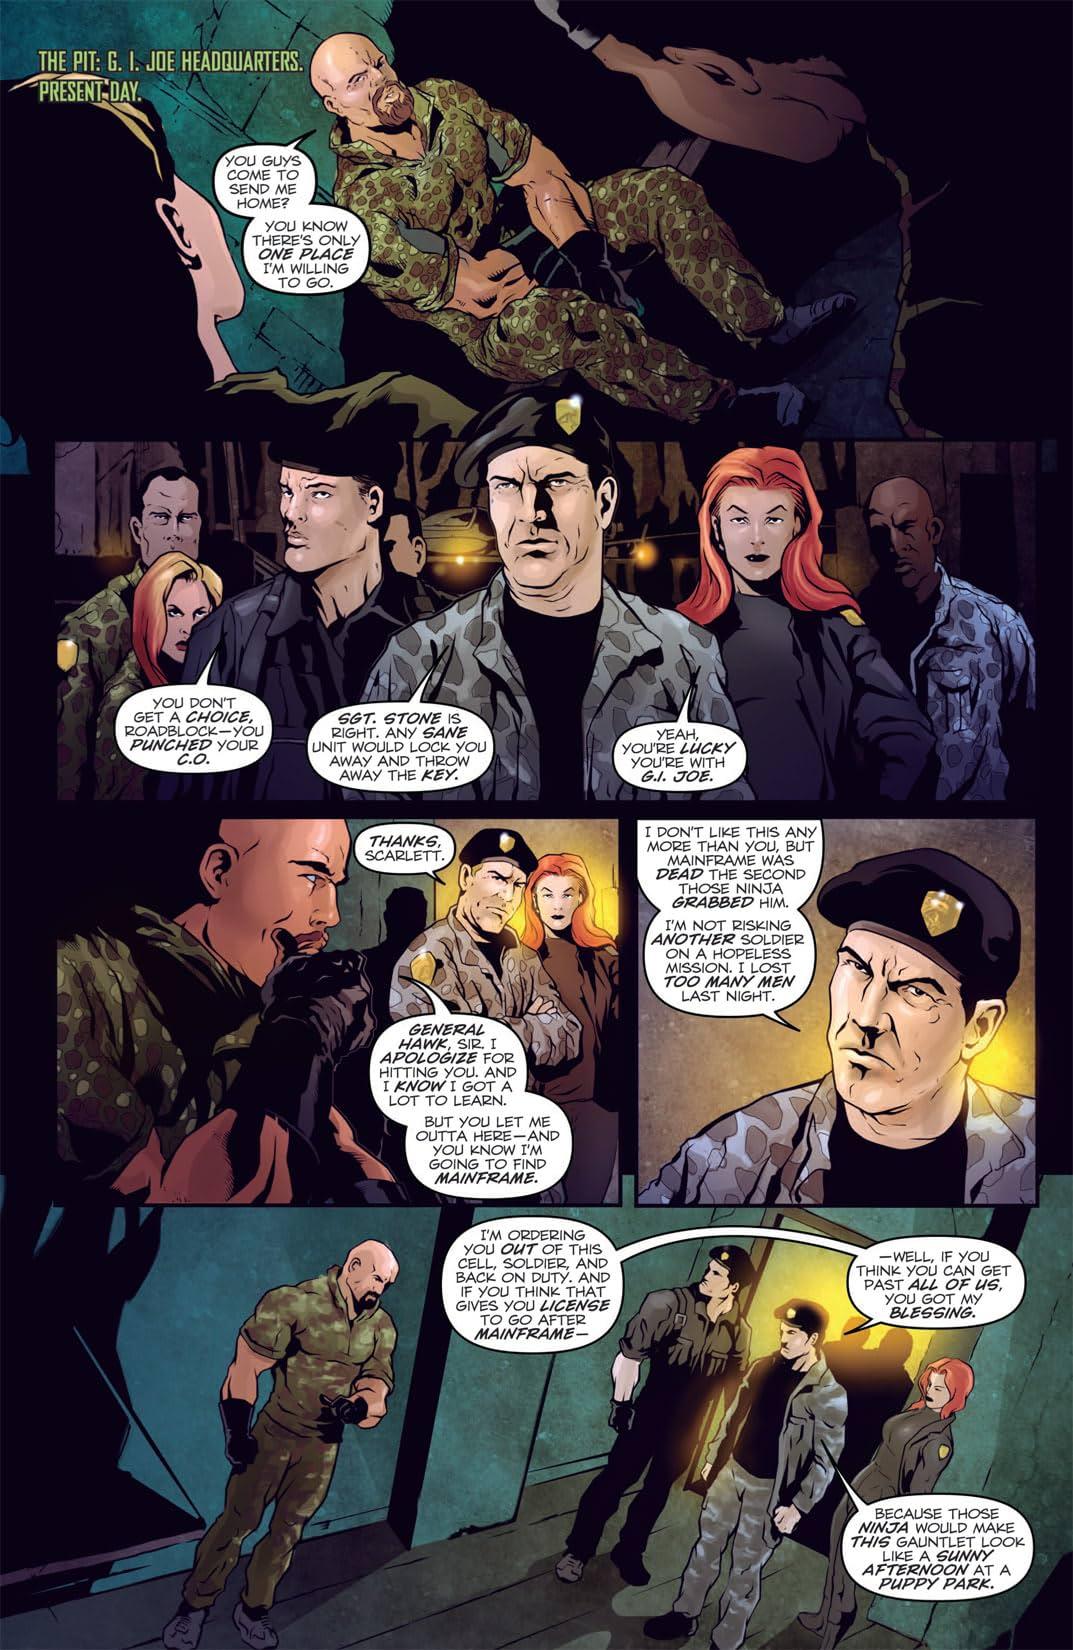 G.I. Joe 2: Movie Prequel - Retaliation #2